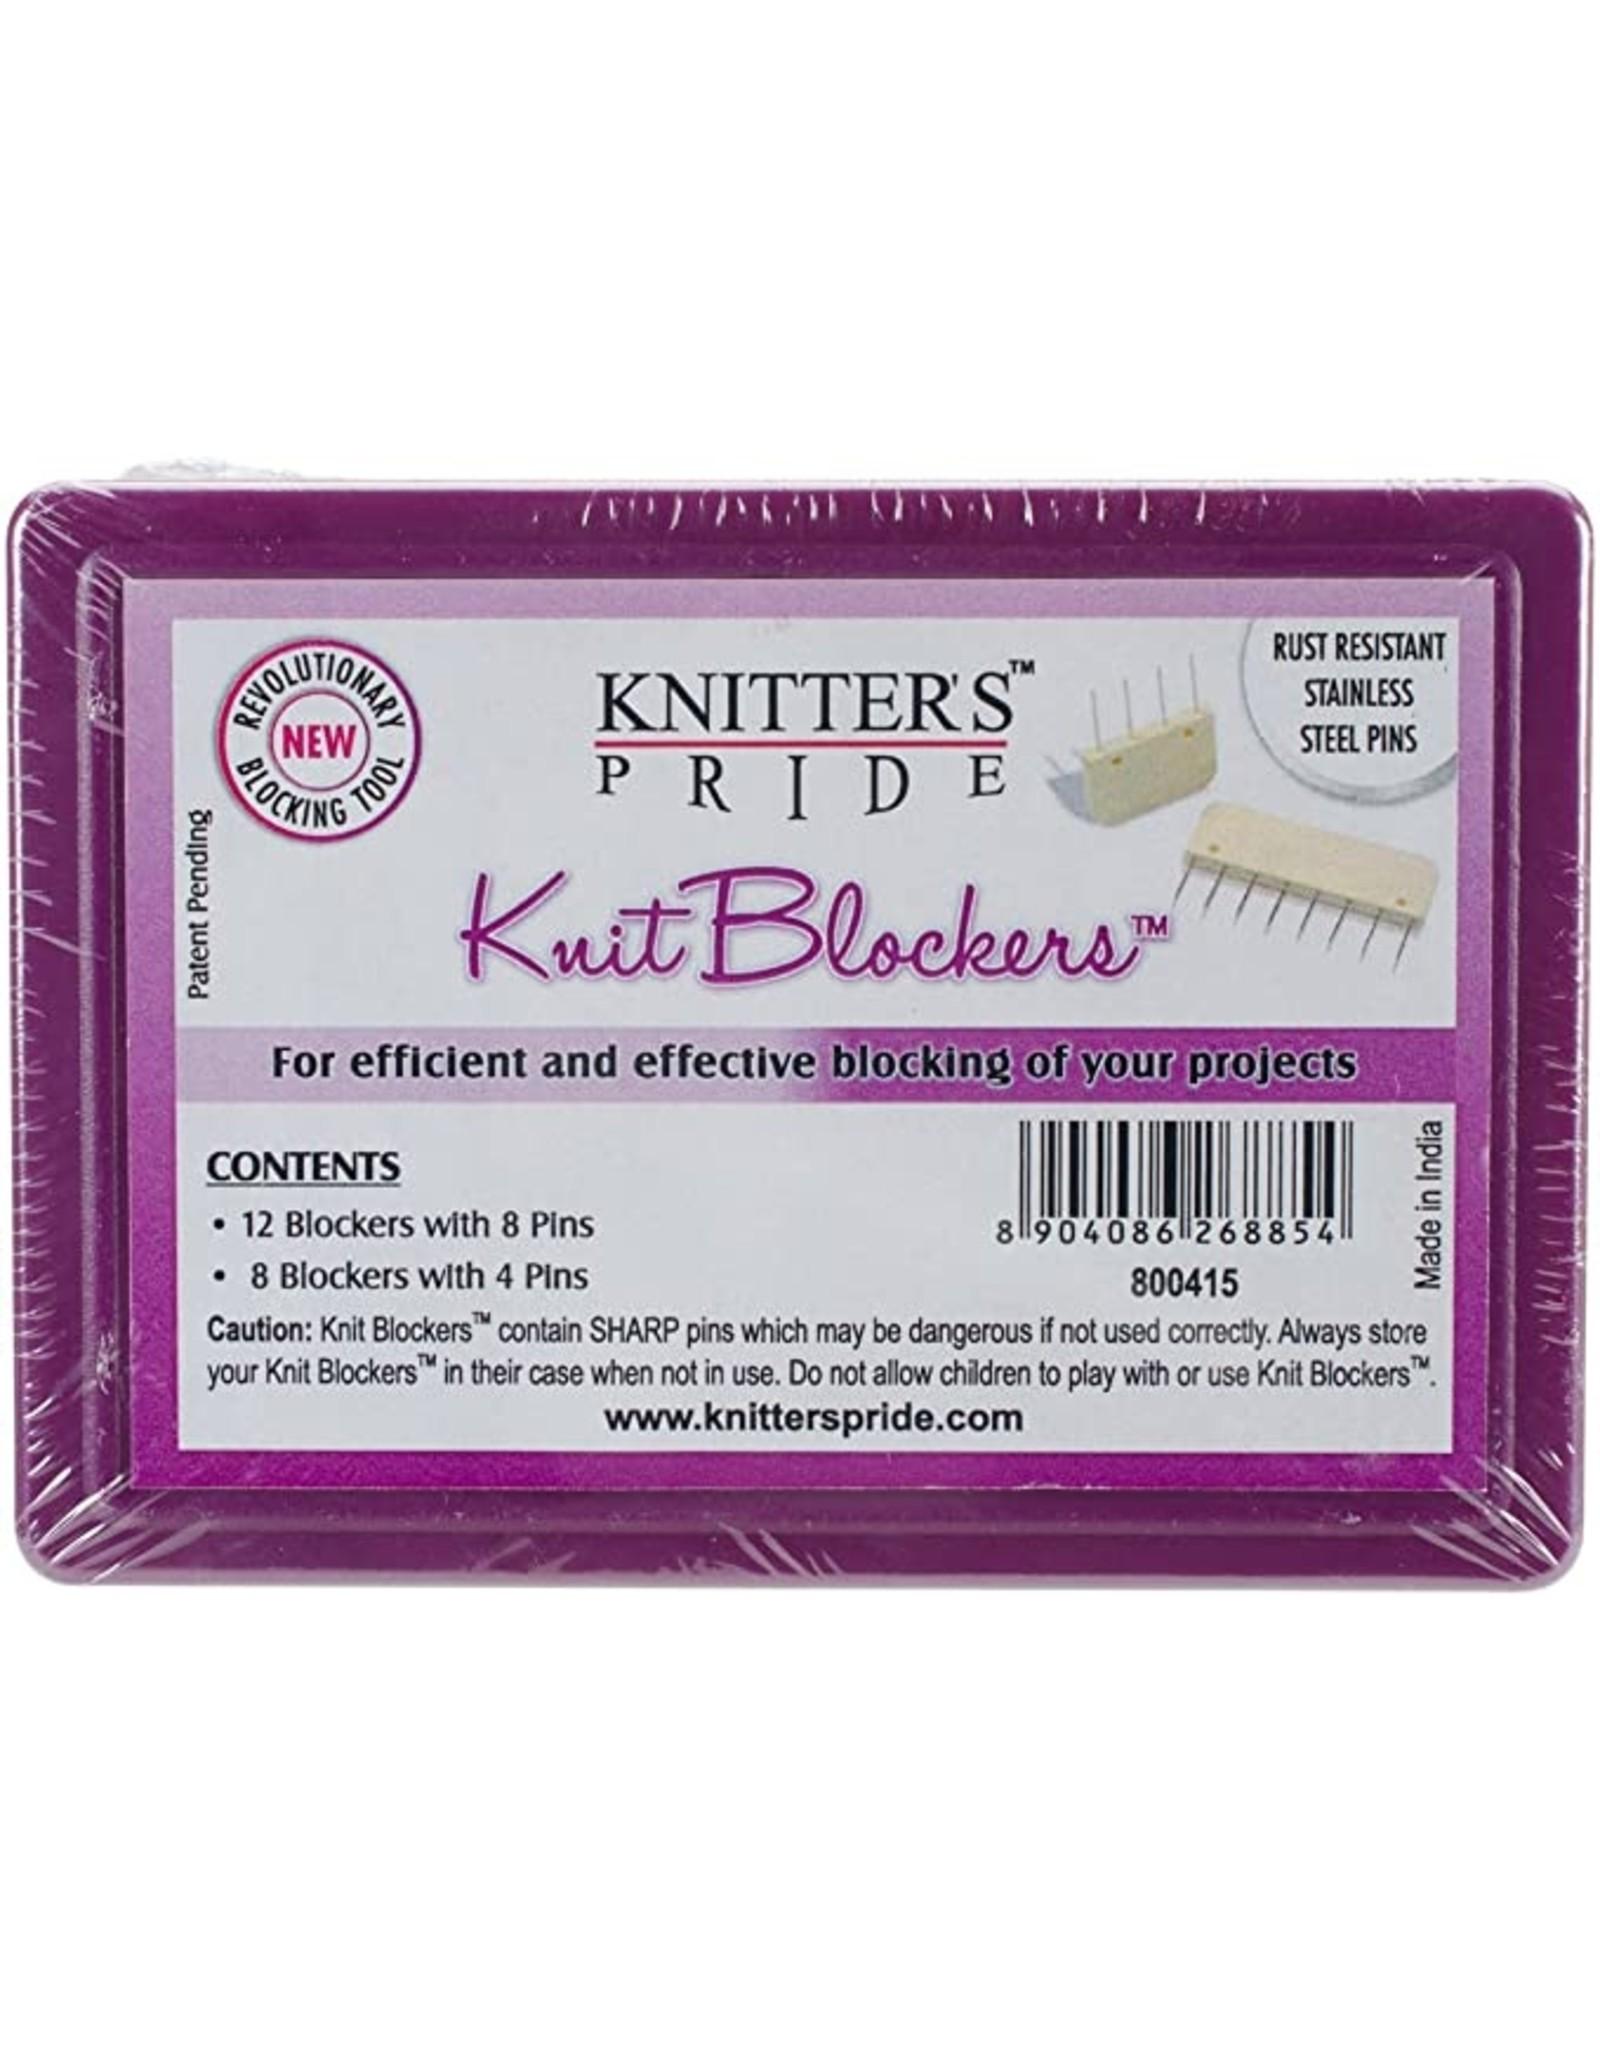 Knitters Pride Knit Blockers